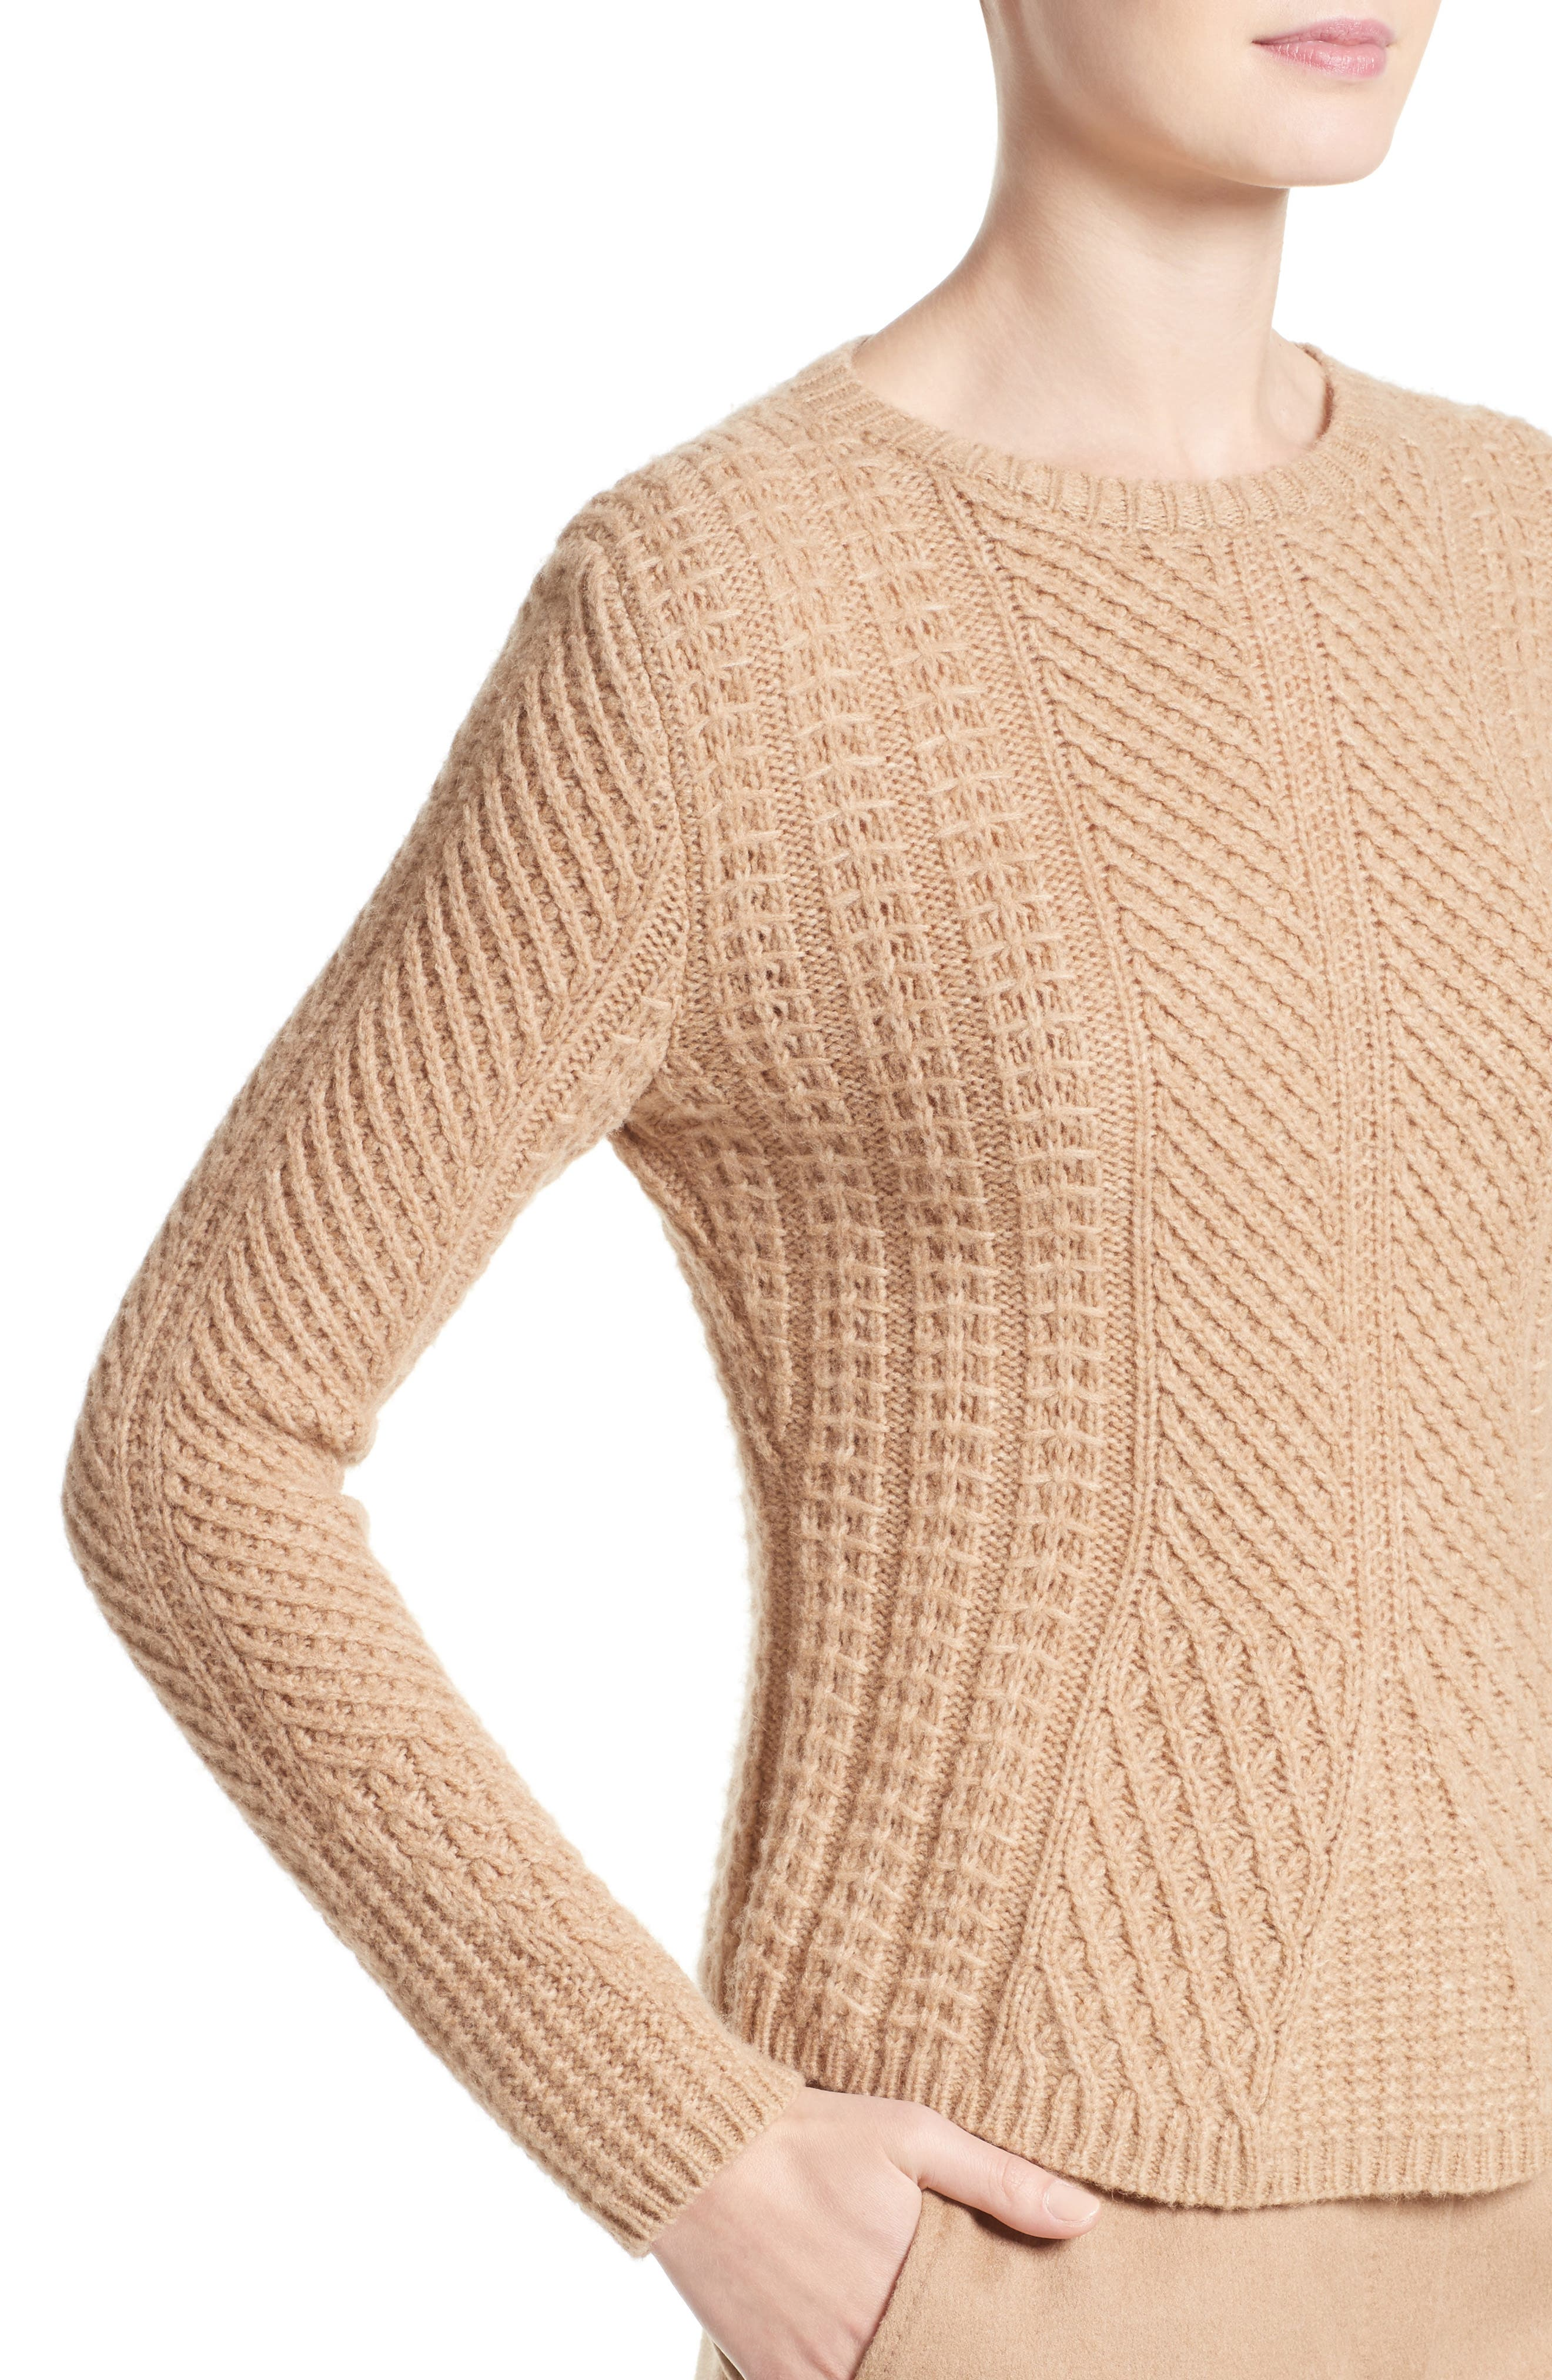 Ronco Sweater,                             Alternate thumbnail 6, color,                             Camel